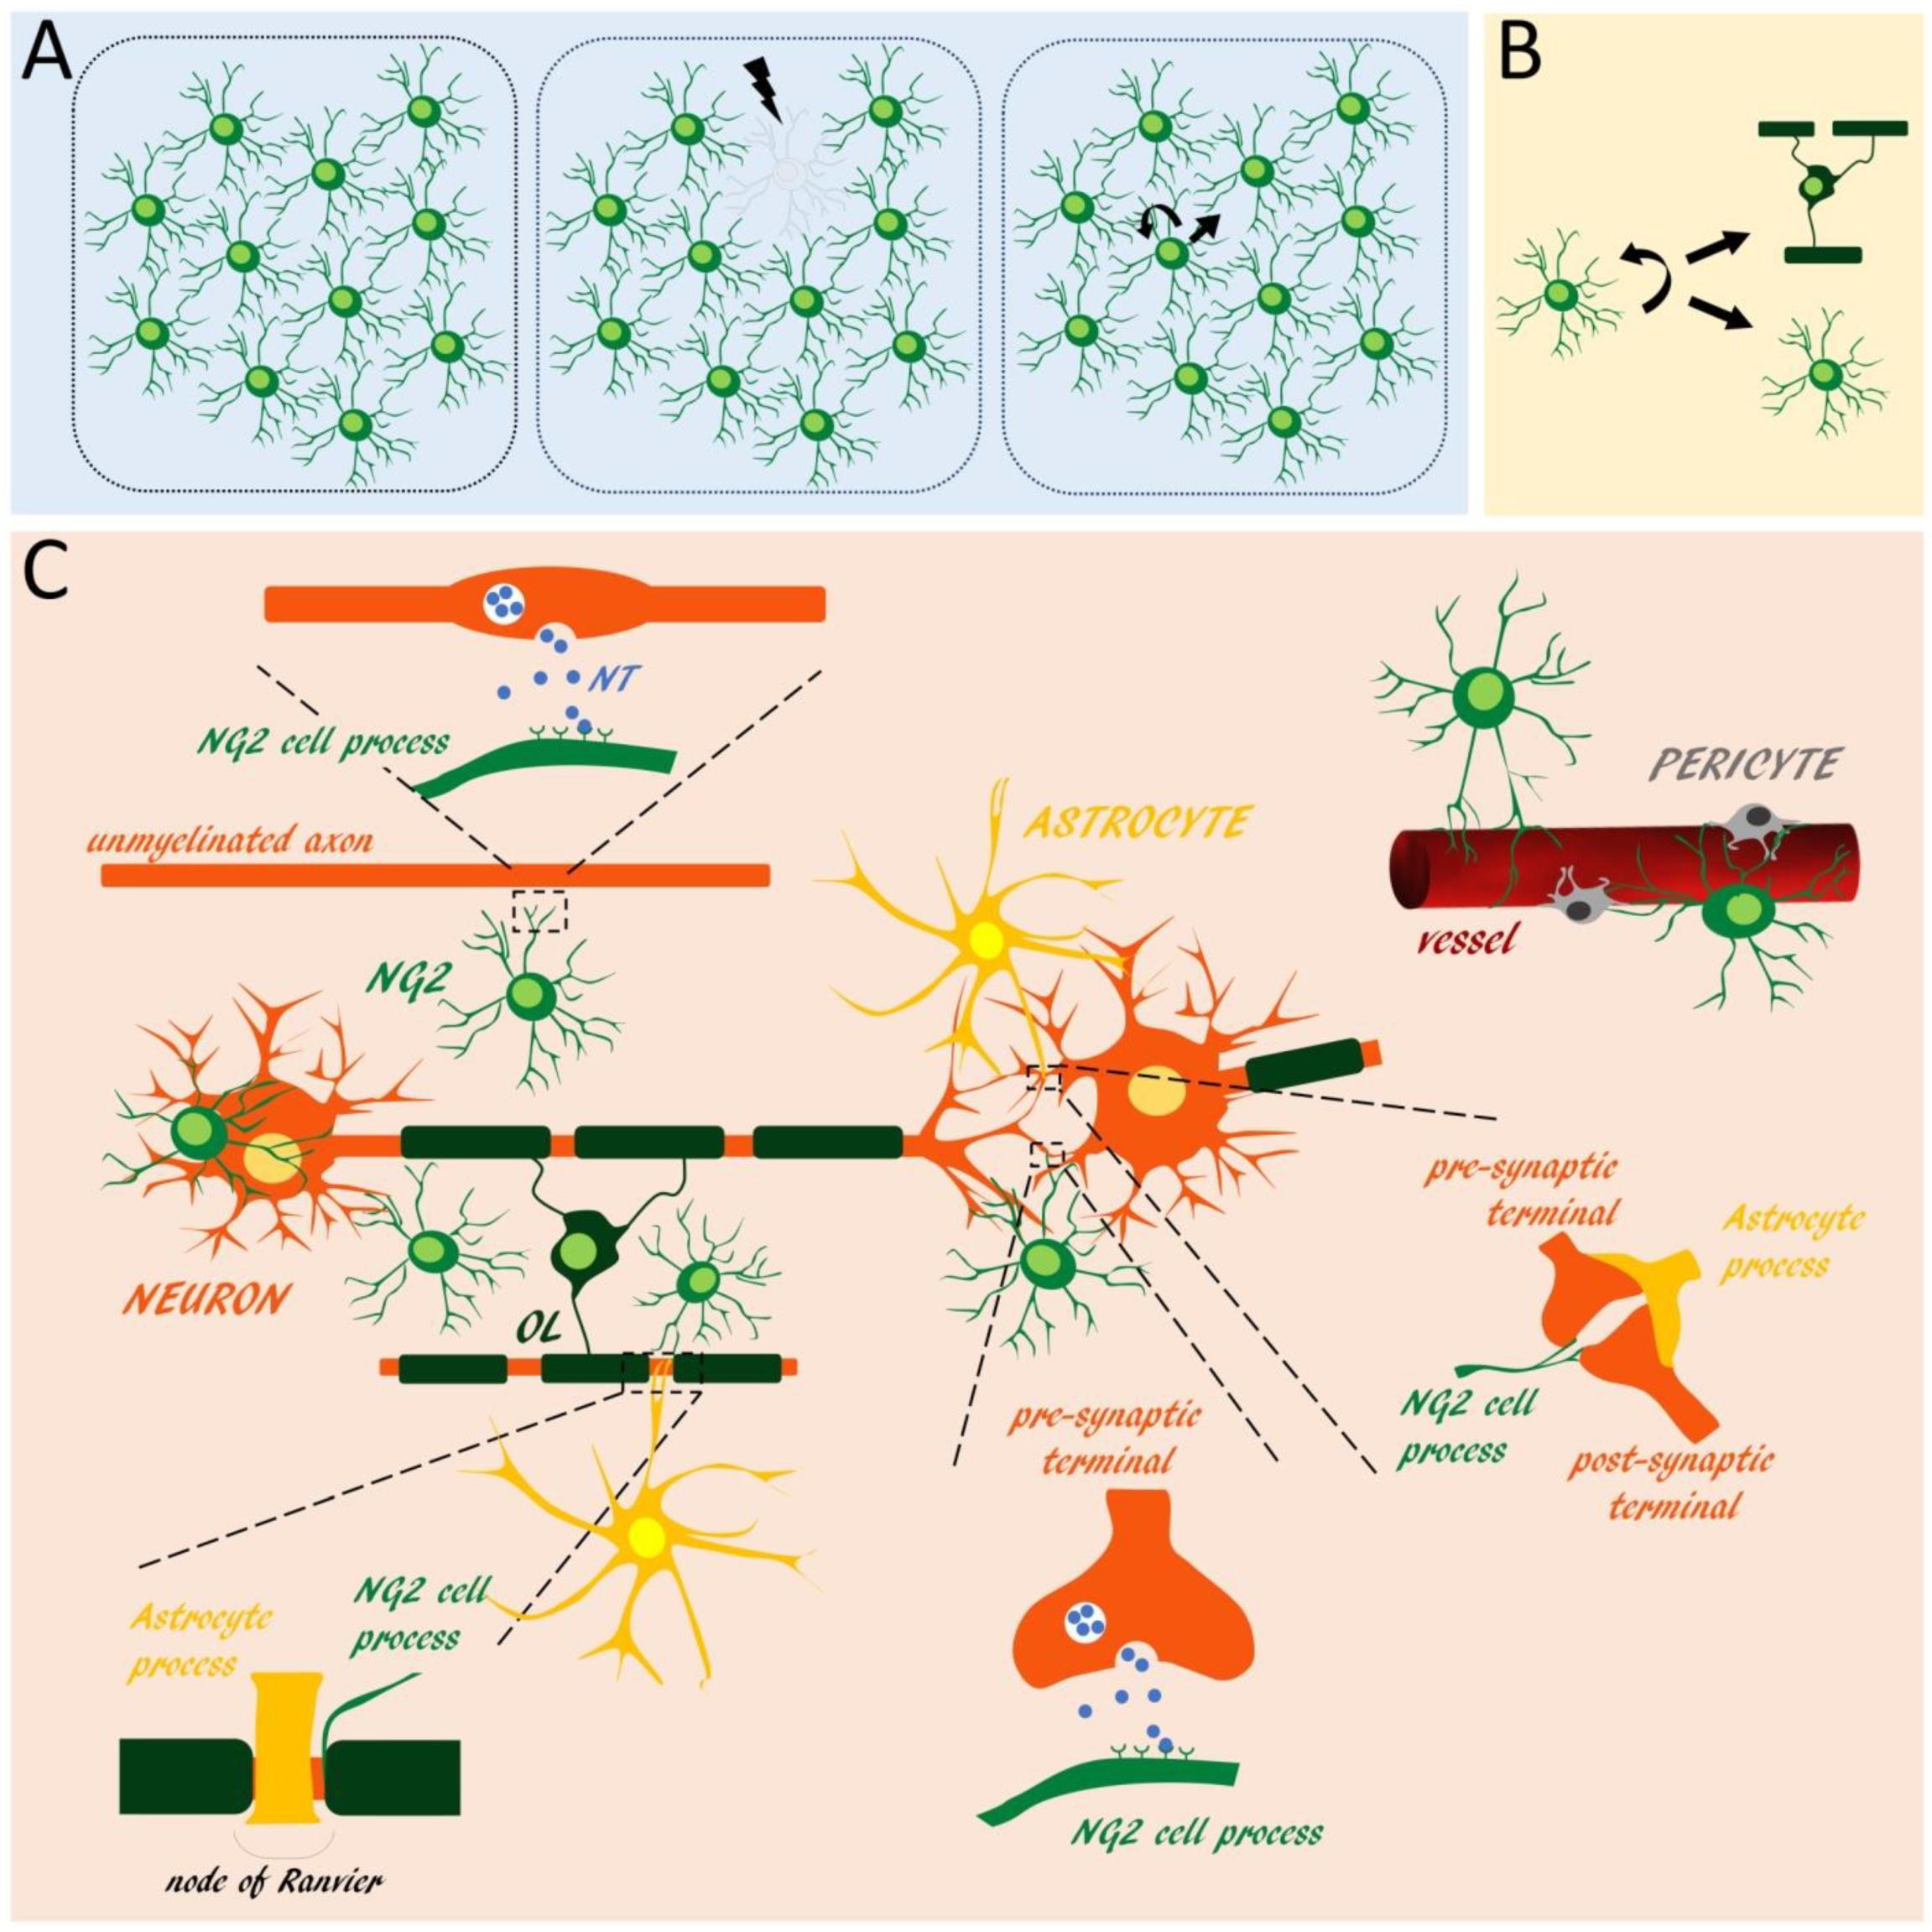 Neuroglia | Free Full-Text | NG2 Glia: Novel Roles beyond Re